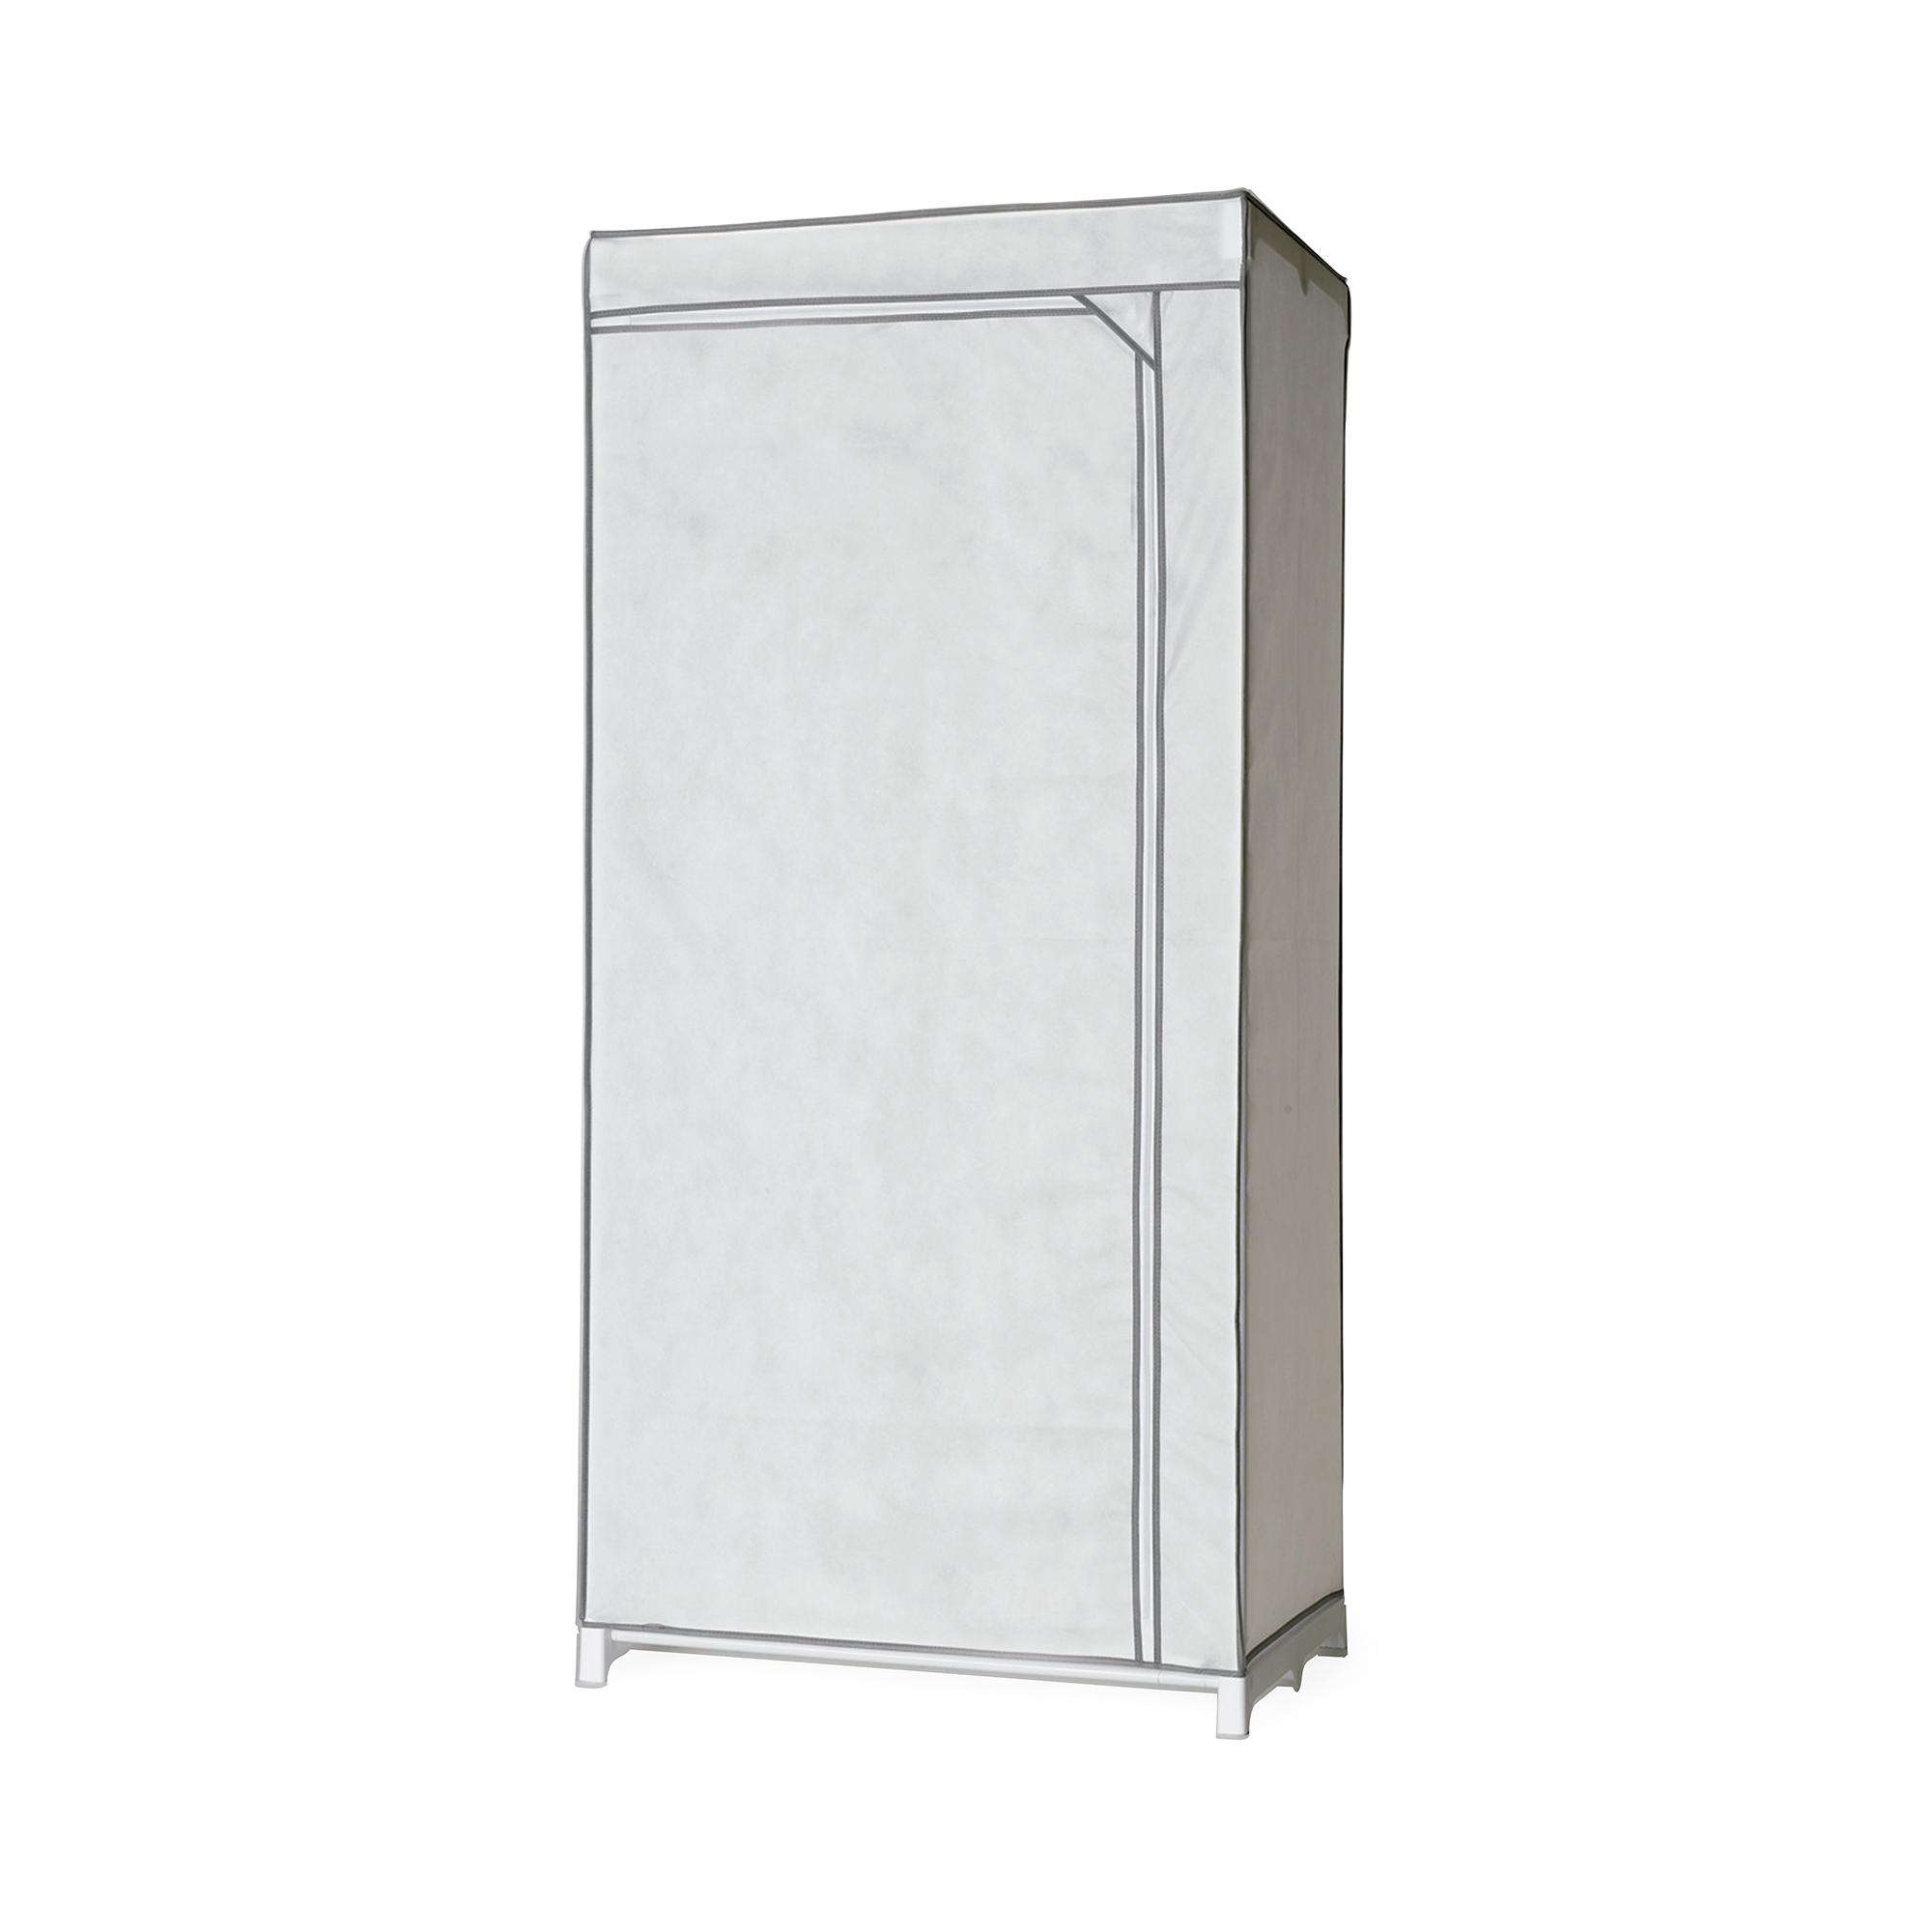 Armoire penderie housse blanche H170cm